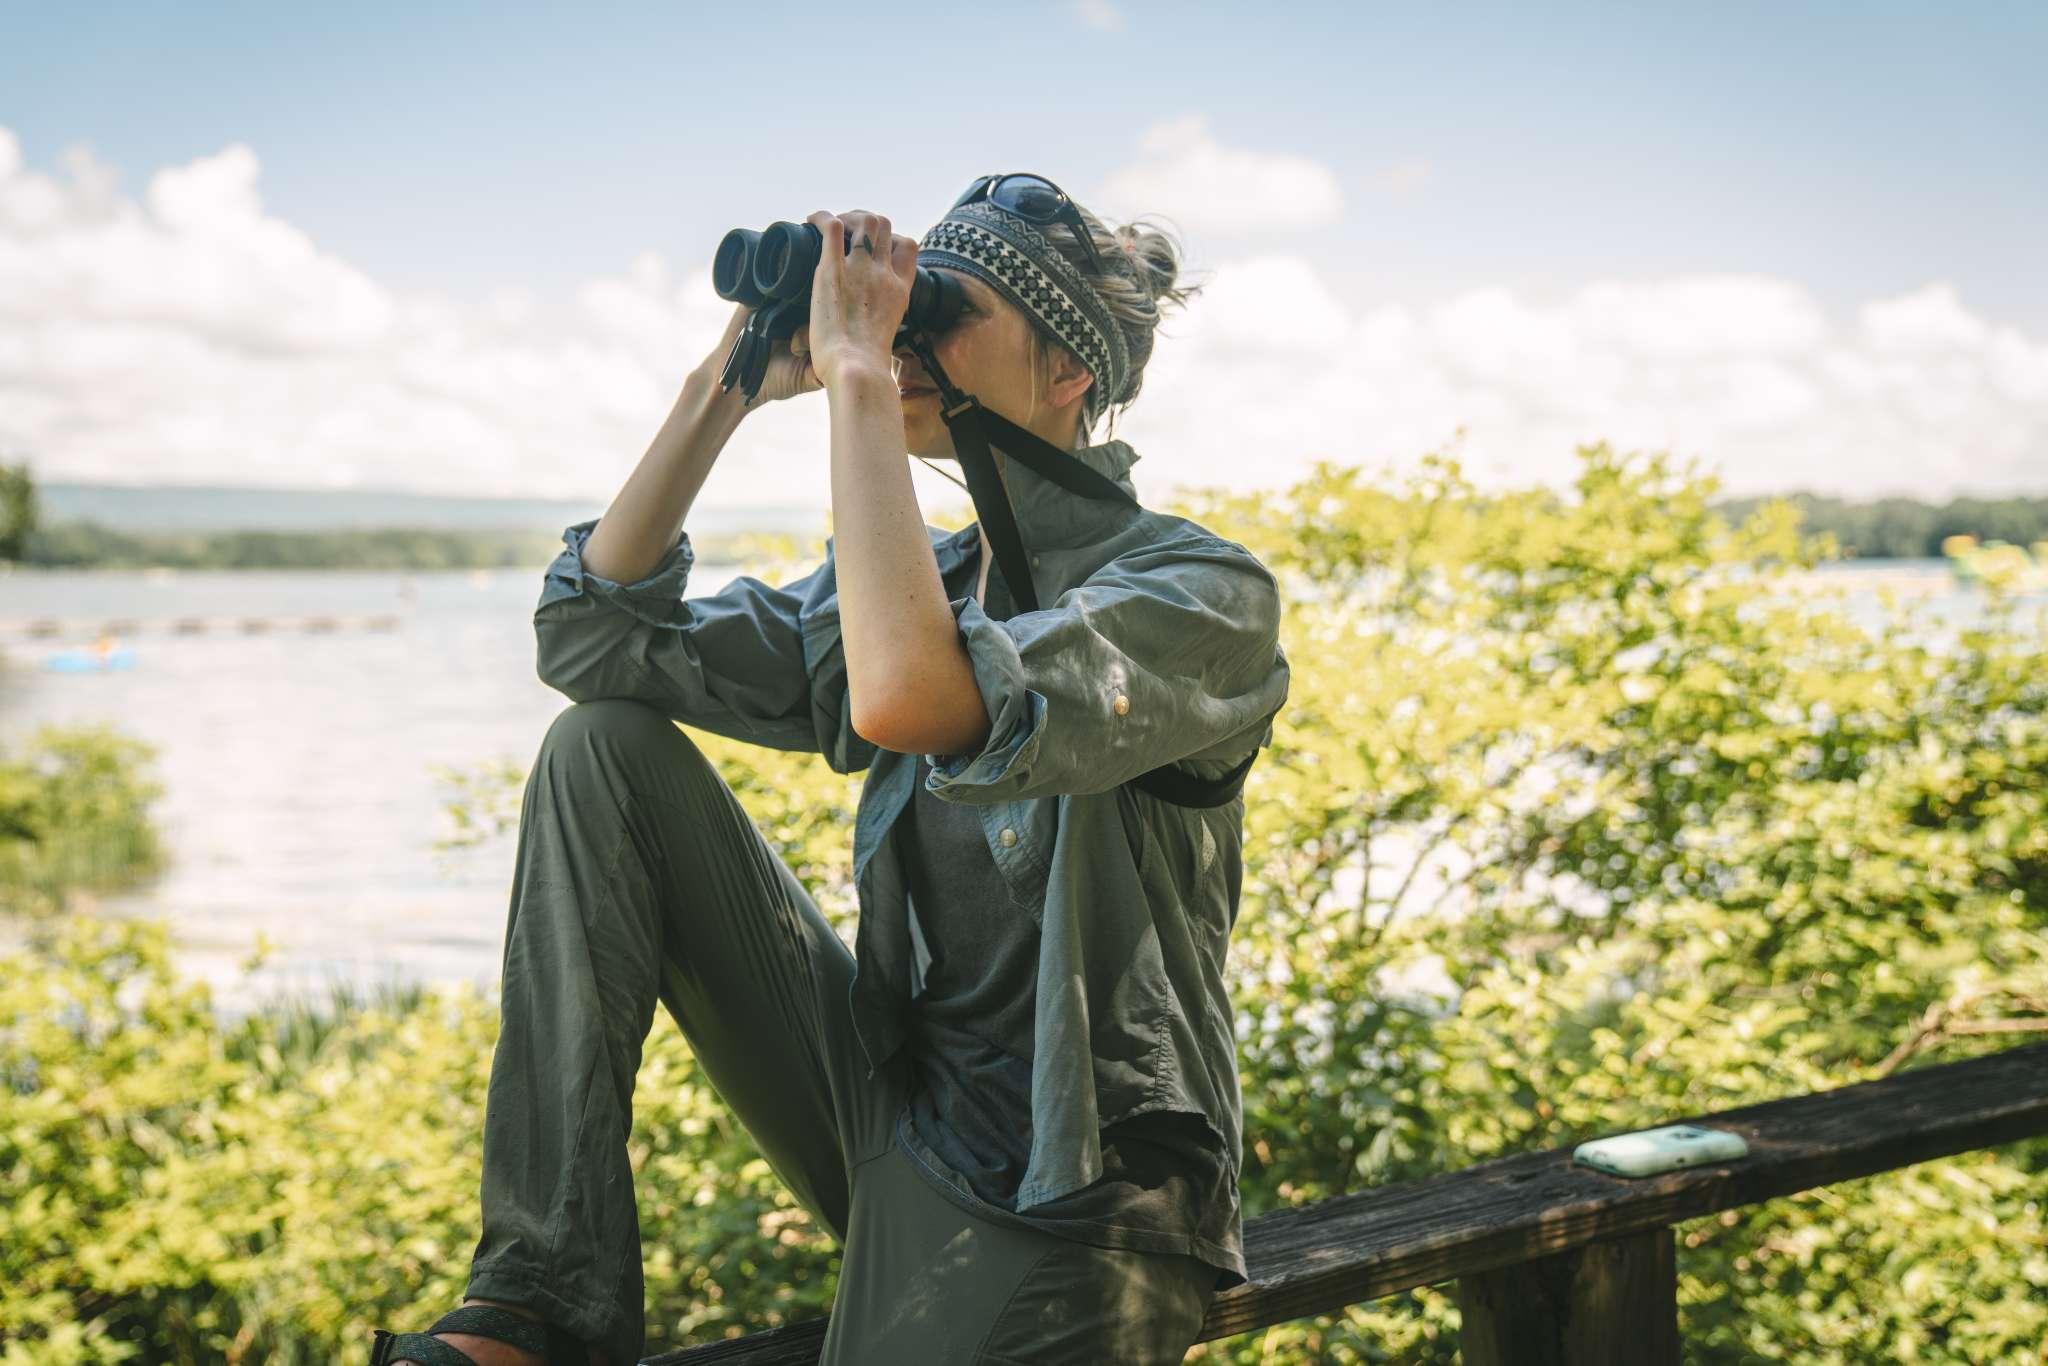 Laura Marsh, founder of Nova Conservation doing wildlife conservation work by looking through binoculars